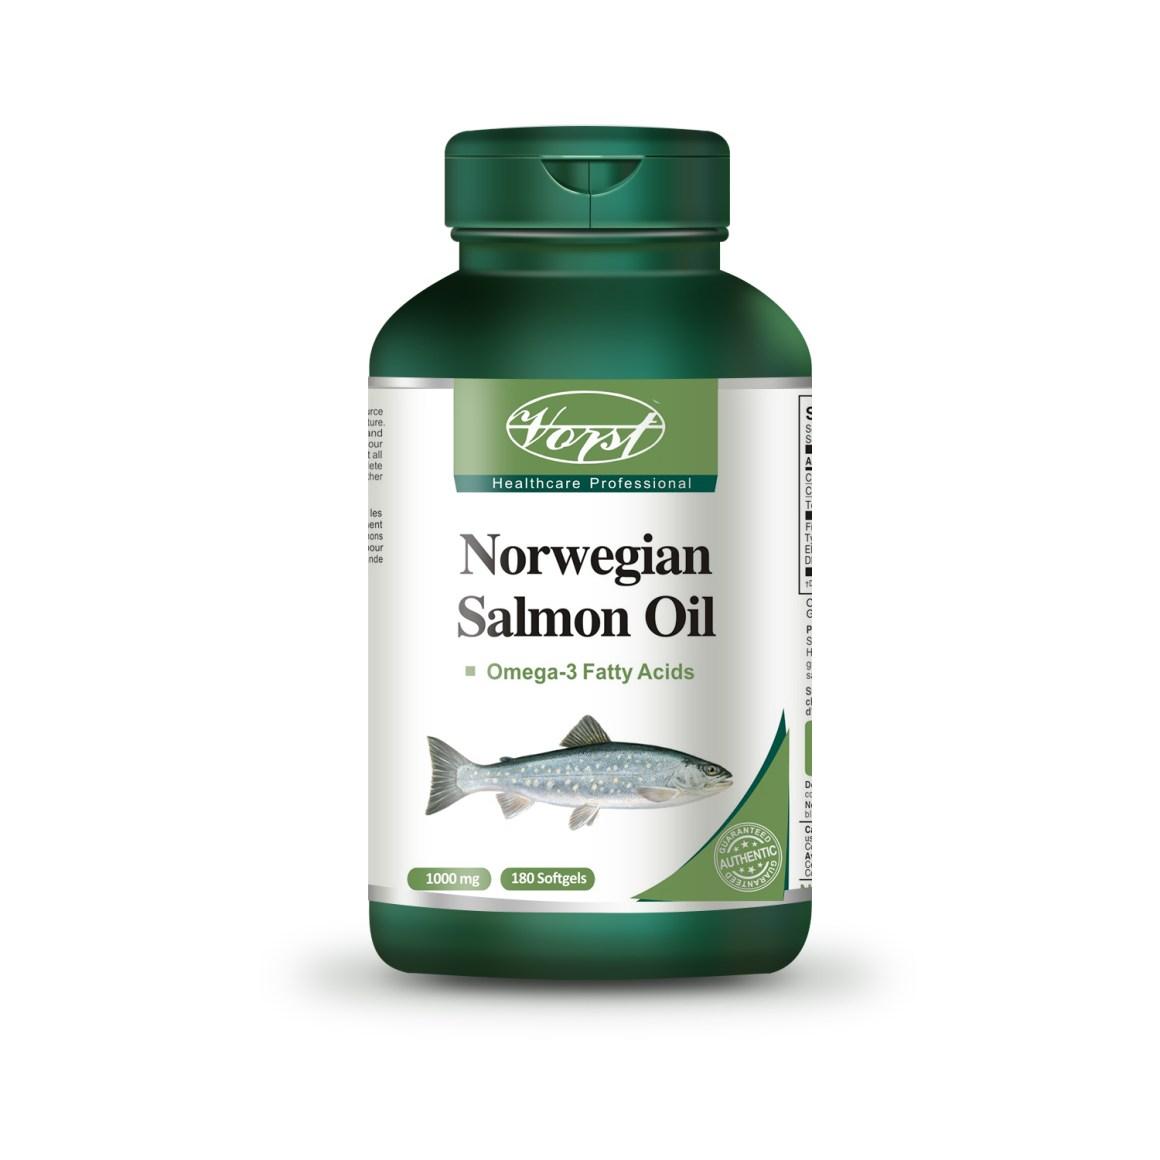 Norwegian Salmon Oil